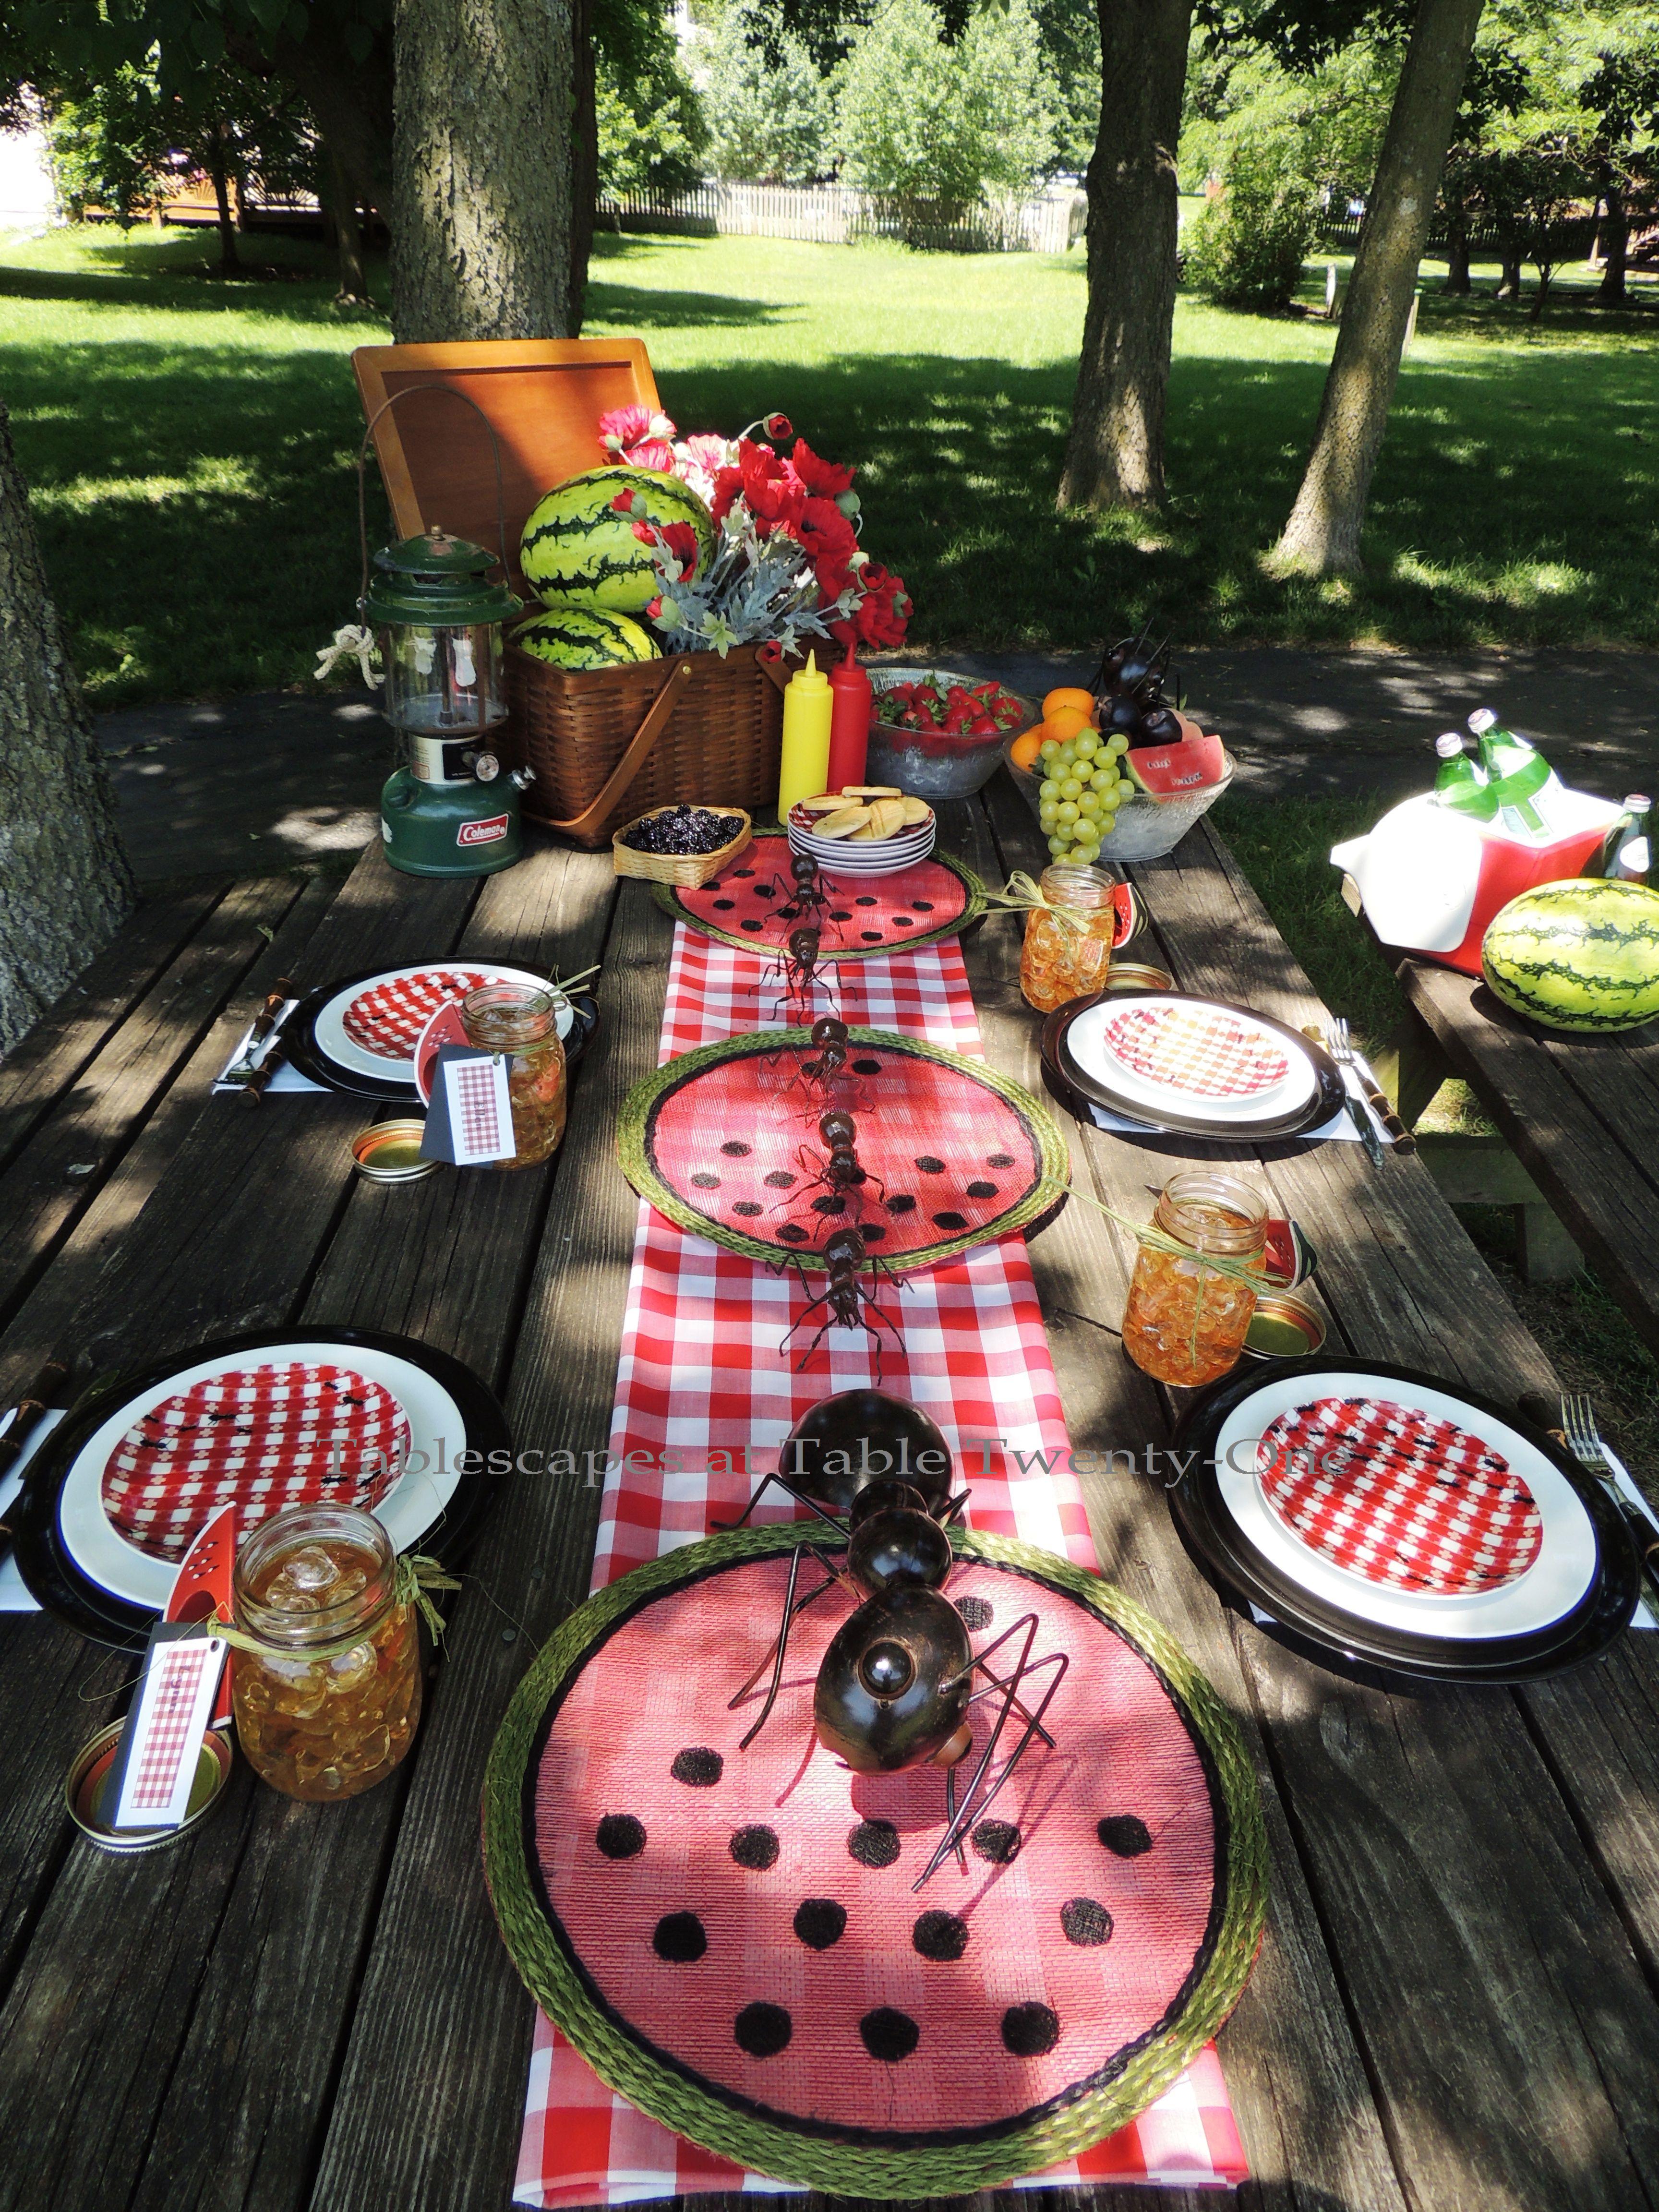 Tablescapes at Table Twenty-One, www.tabletwentyone.wordpress.com, Picnic Ants - Full tabletop